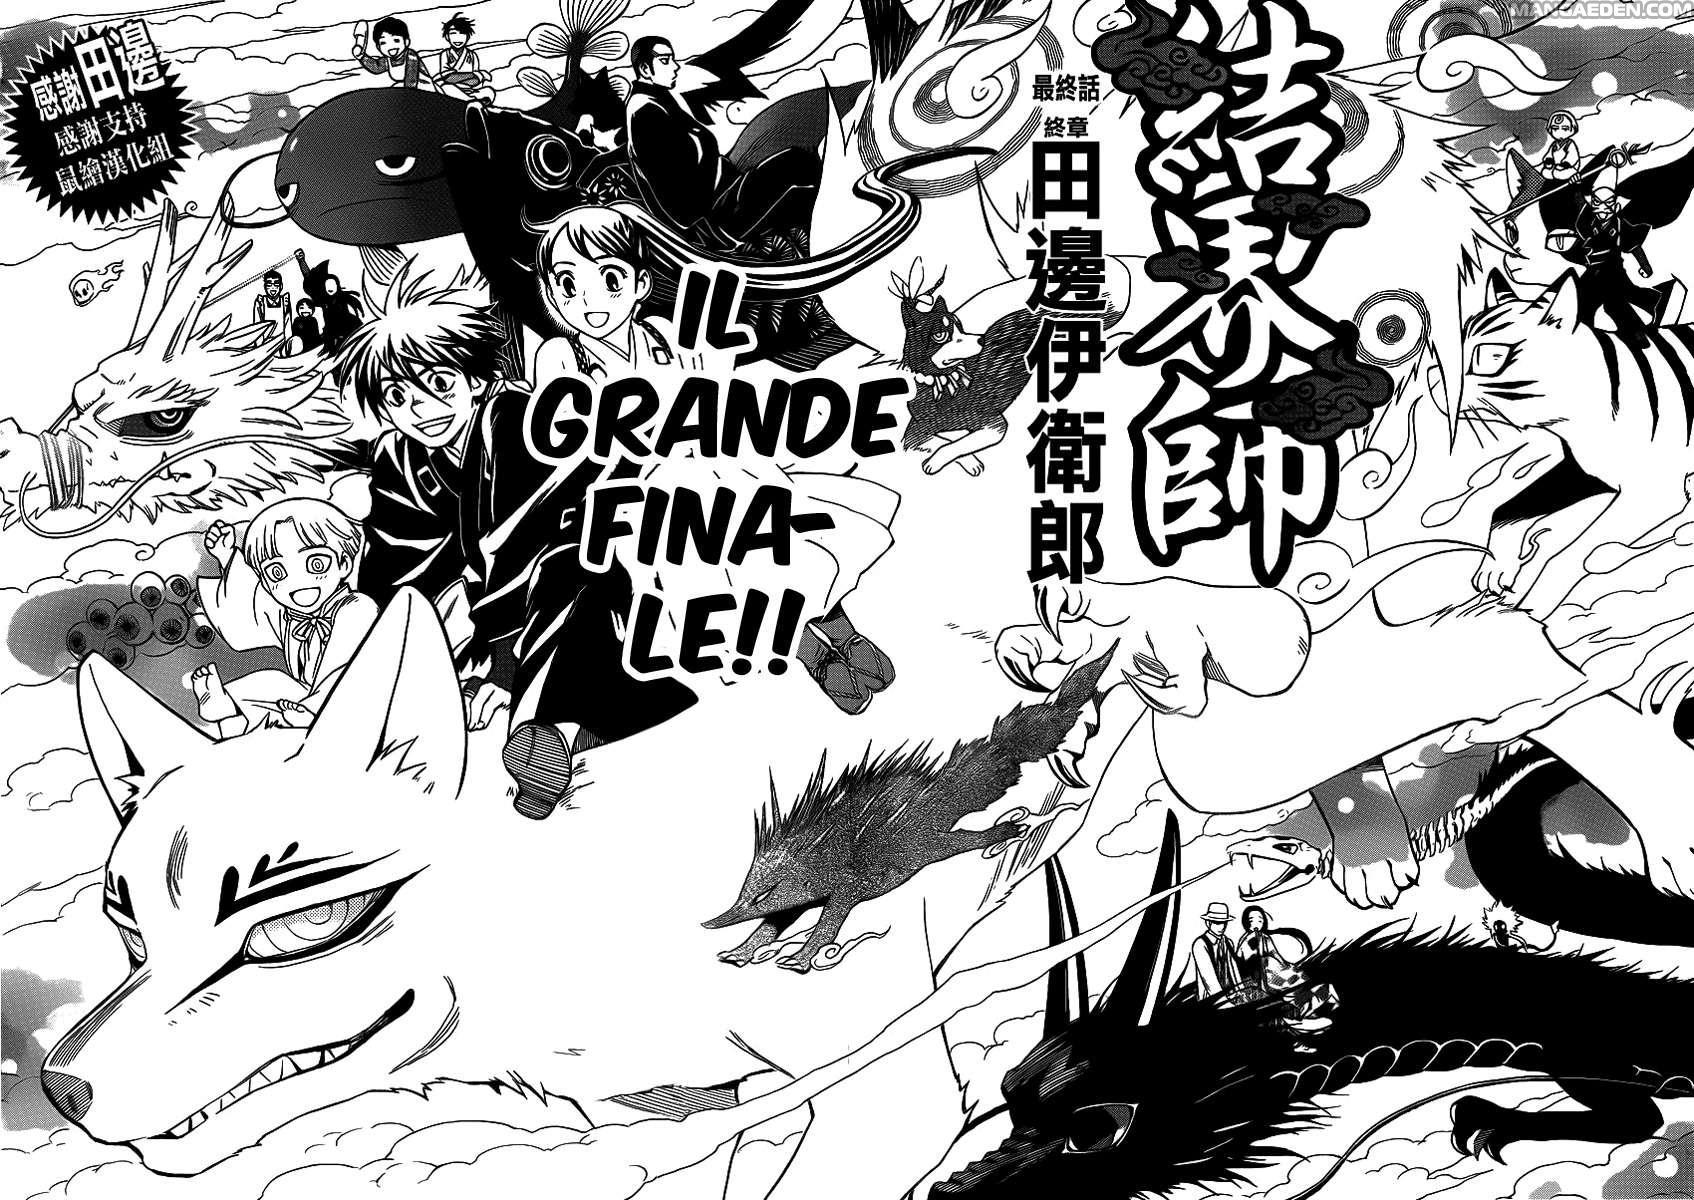 https://nine.mangadogs.com/it_manga/pic/10/74/197483/Kekkaishi345Ilgrandefinale486.jpg Page 3